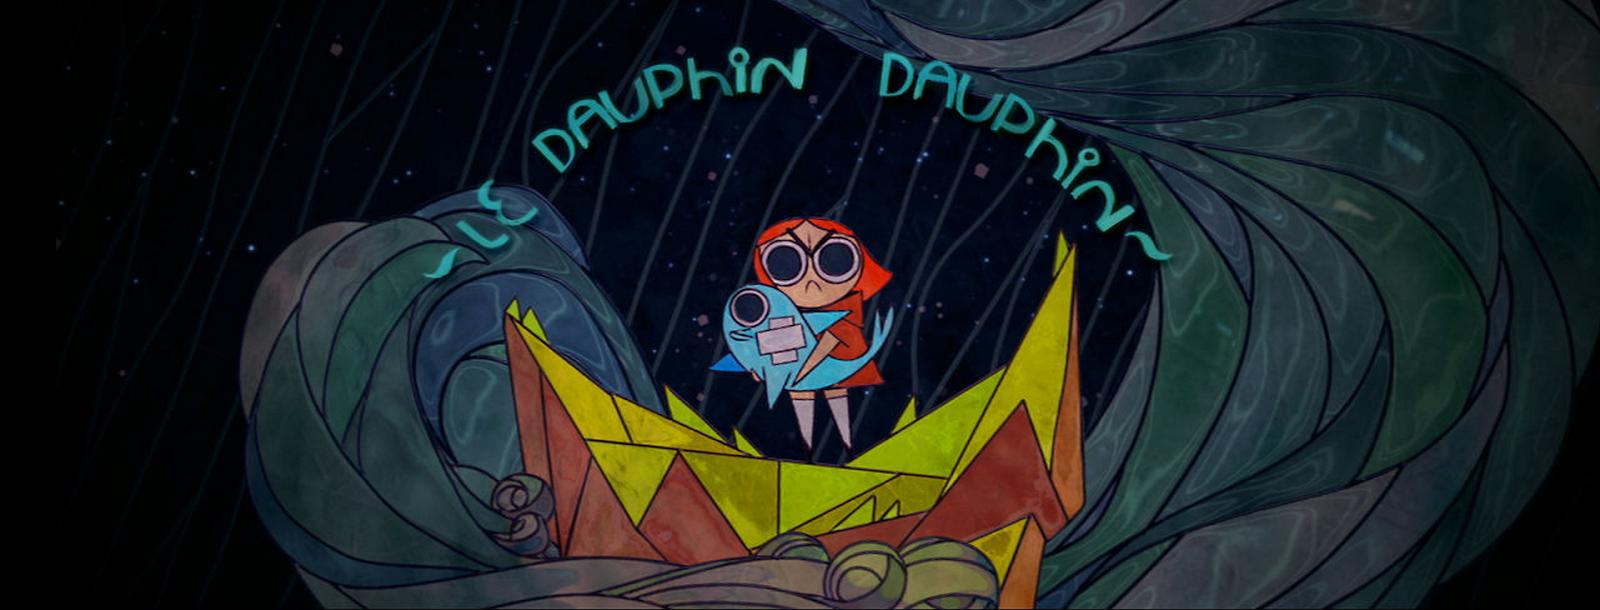 Le Dauphin dauphin